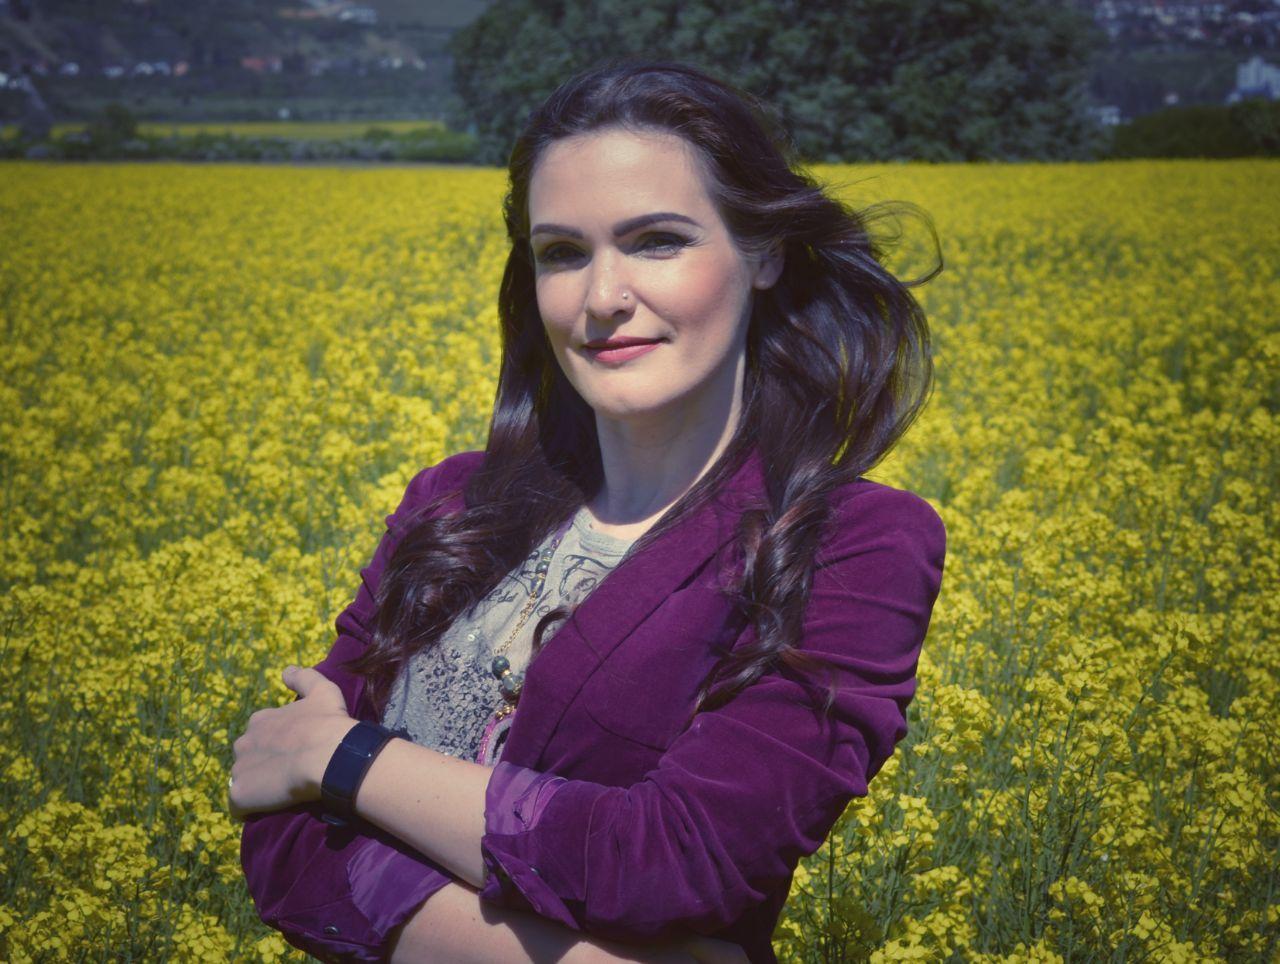 личная сила, работа с силой, психолог онлайн, Светлана Гроисс